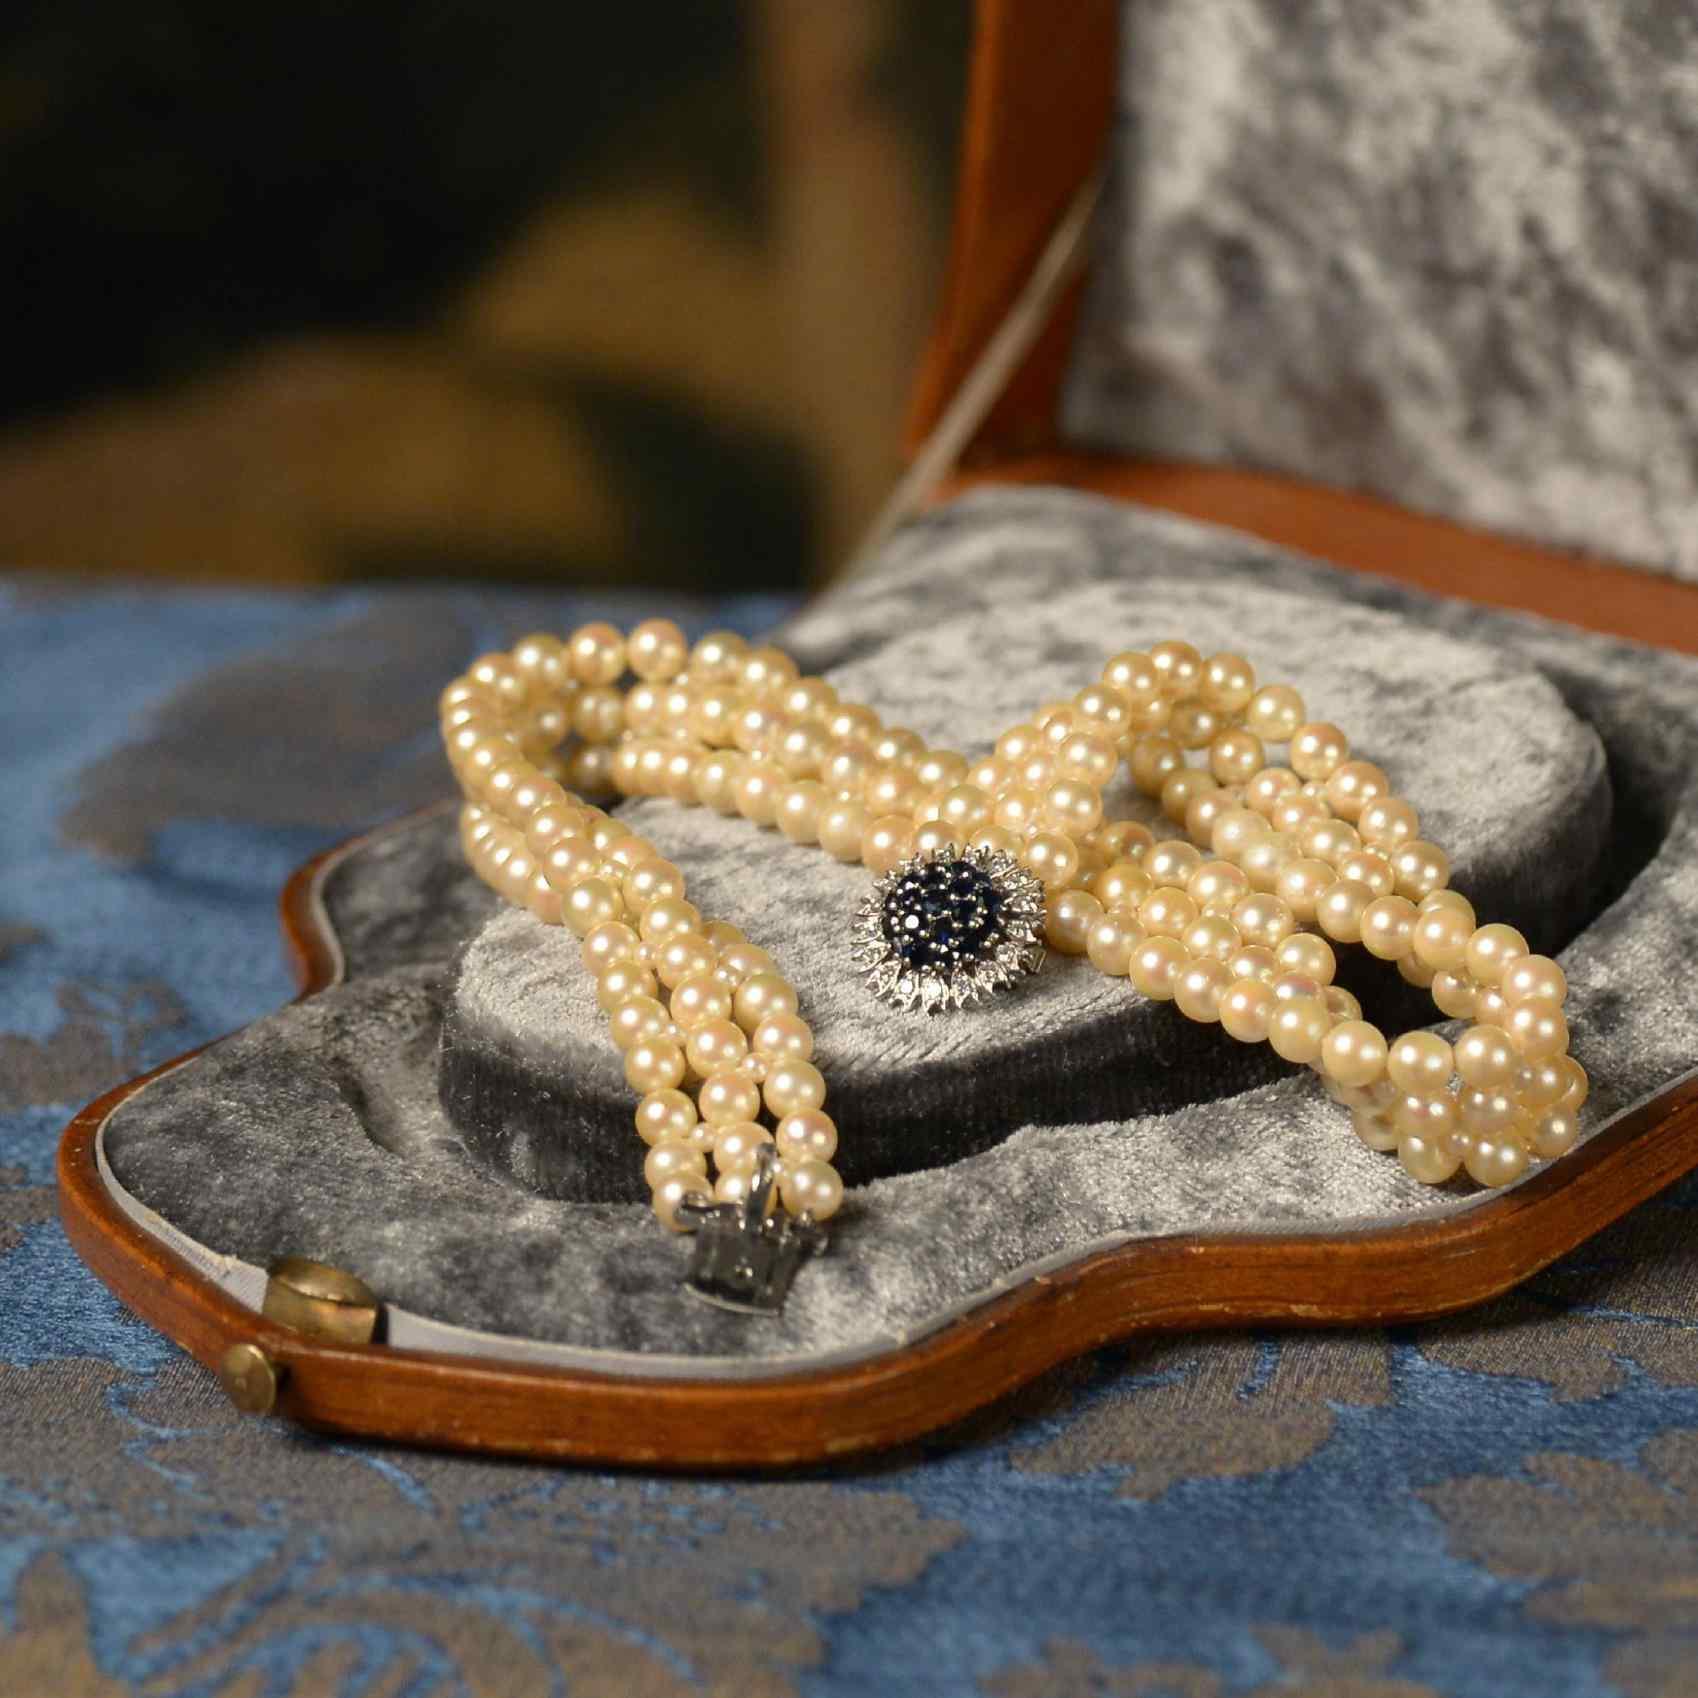 Collier de perles signée Mellerio dit Meller